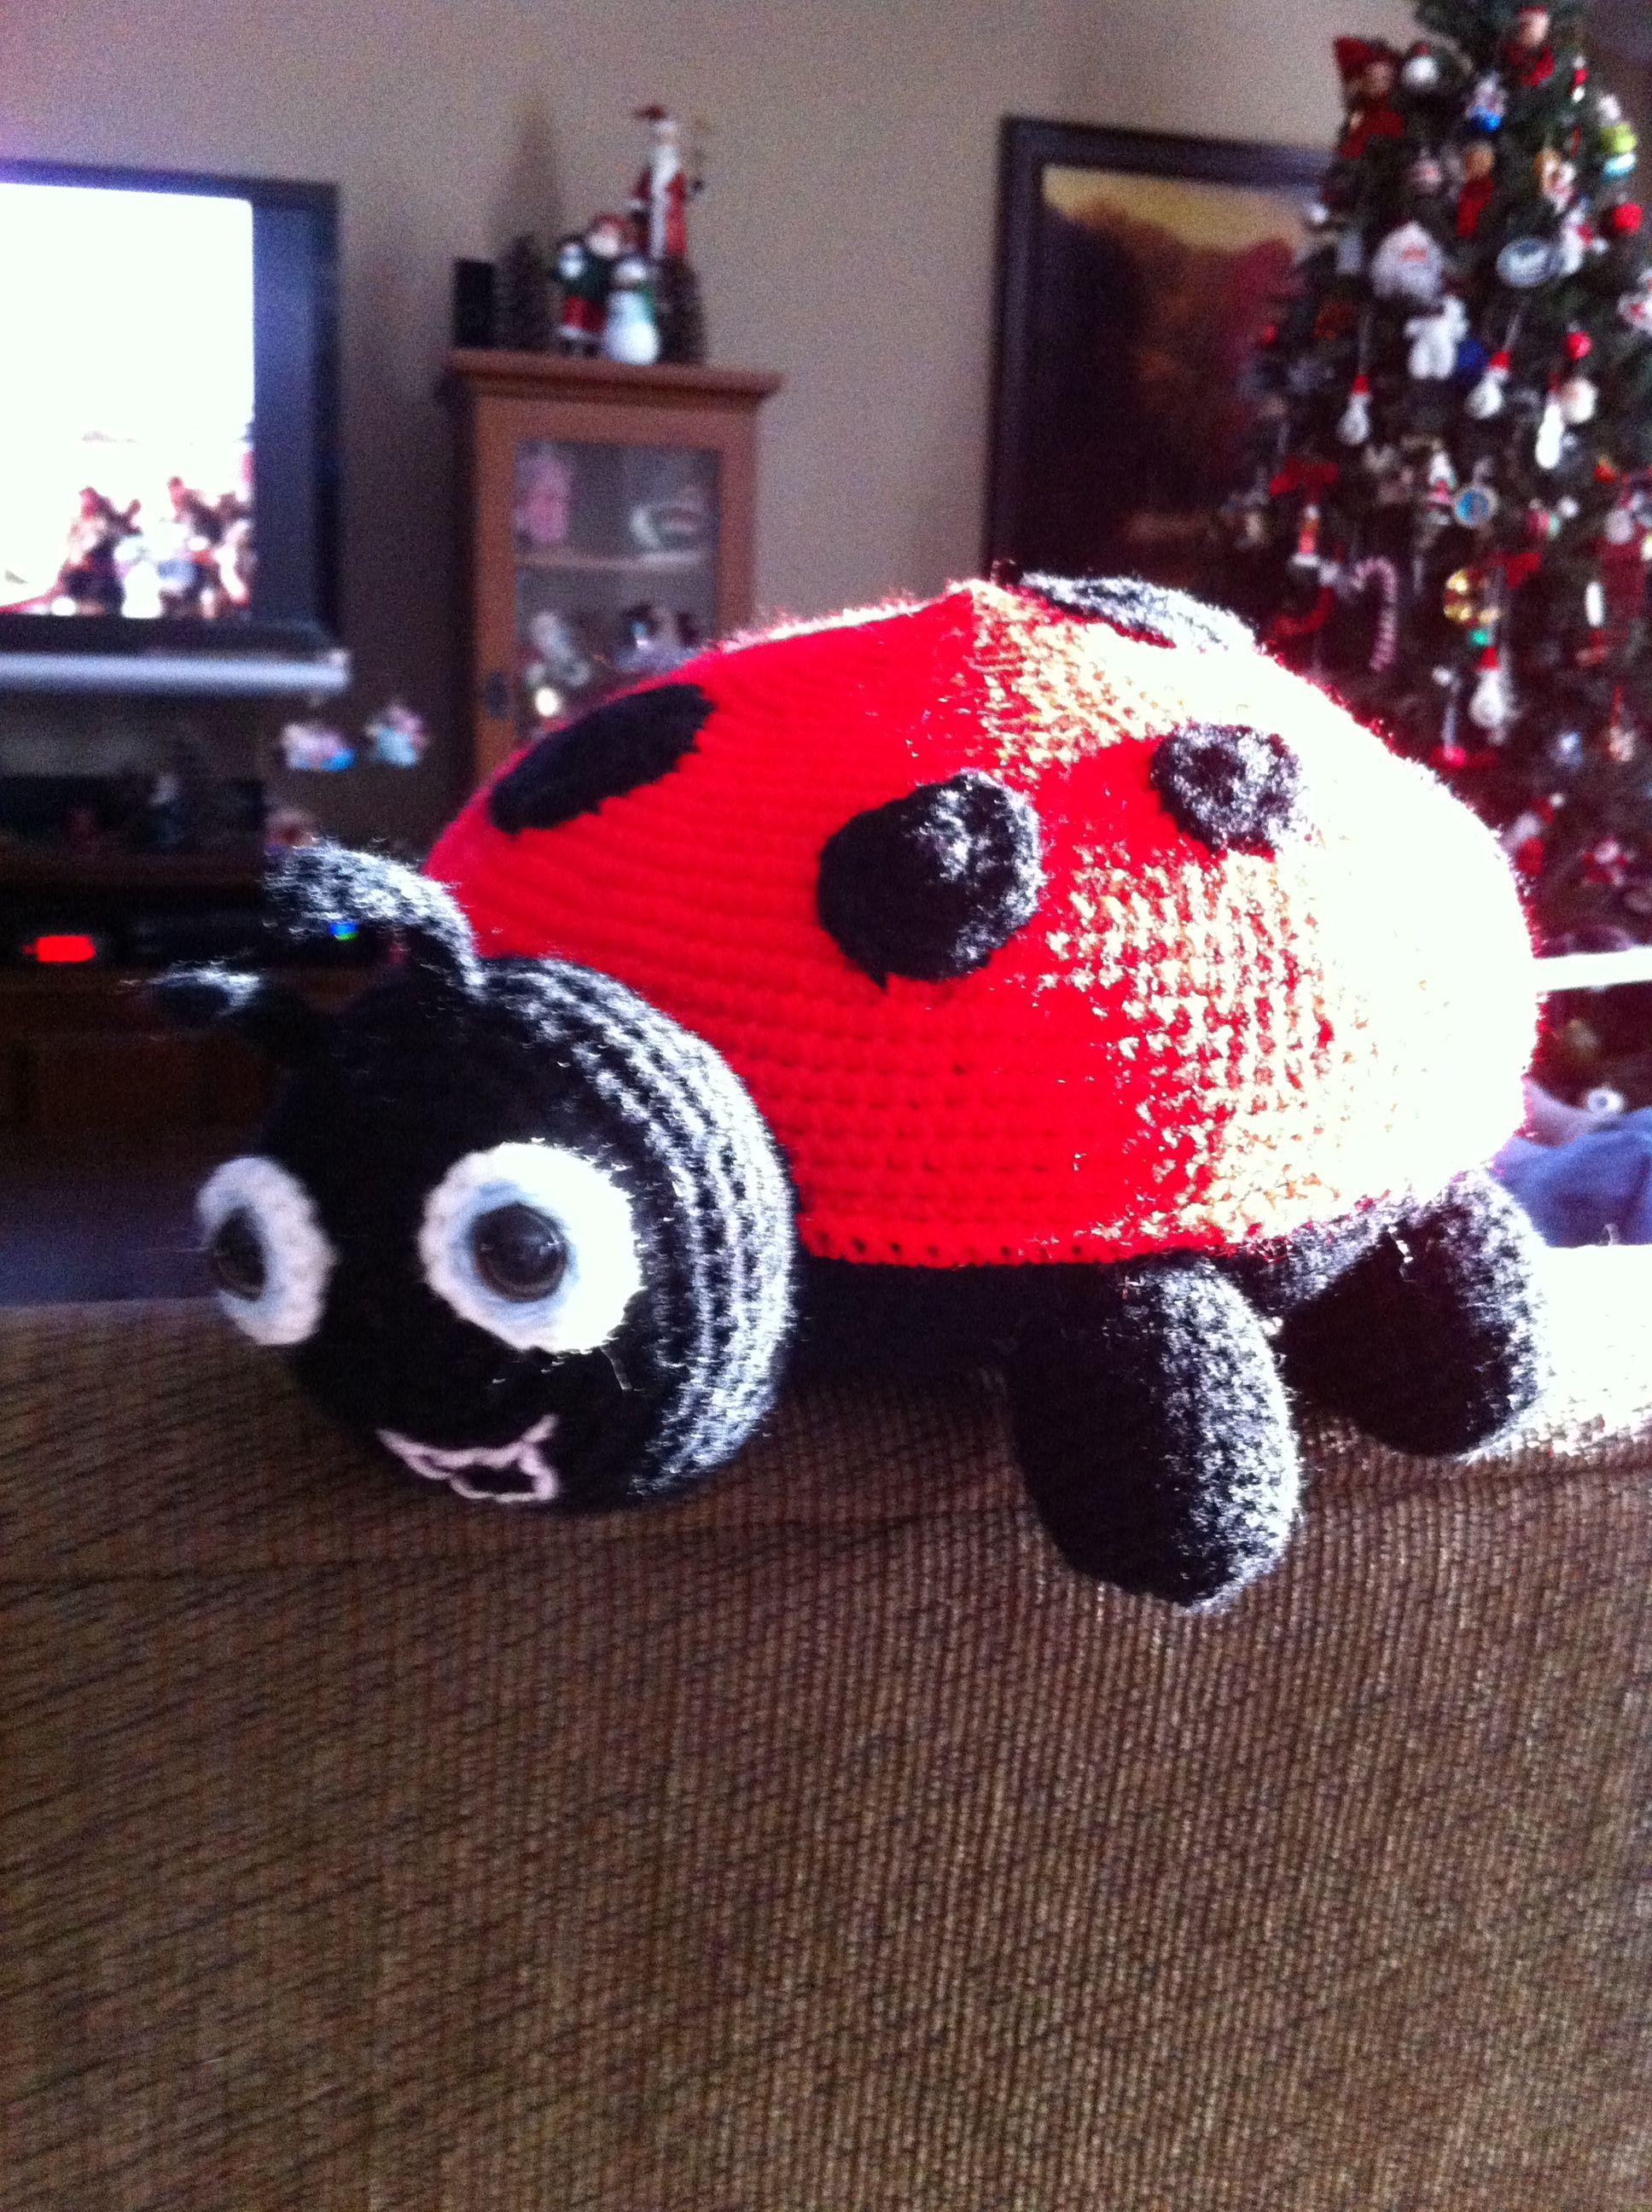 crocheted ladybug pillow  pattern found in Crochet World Magazine